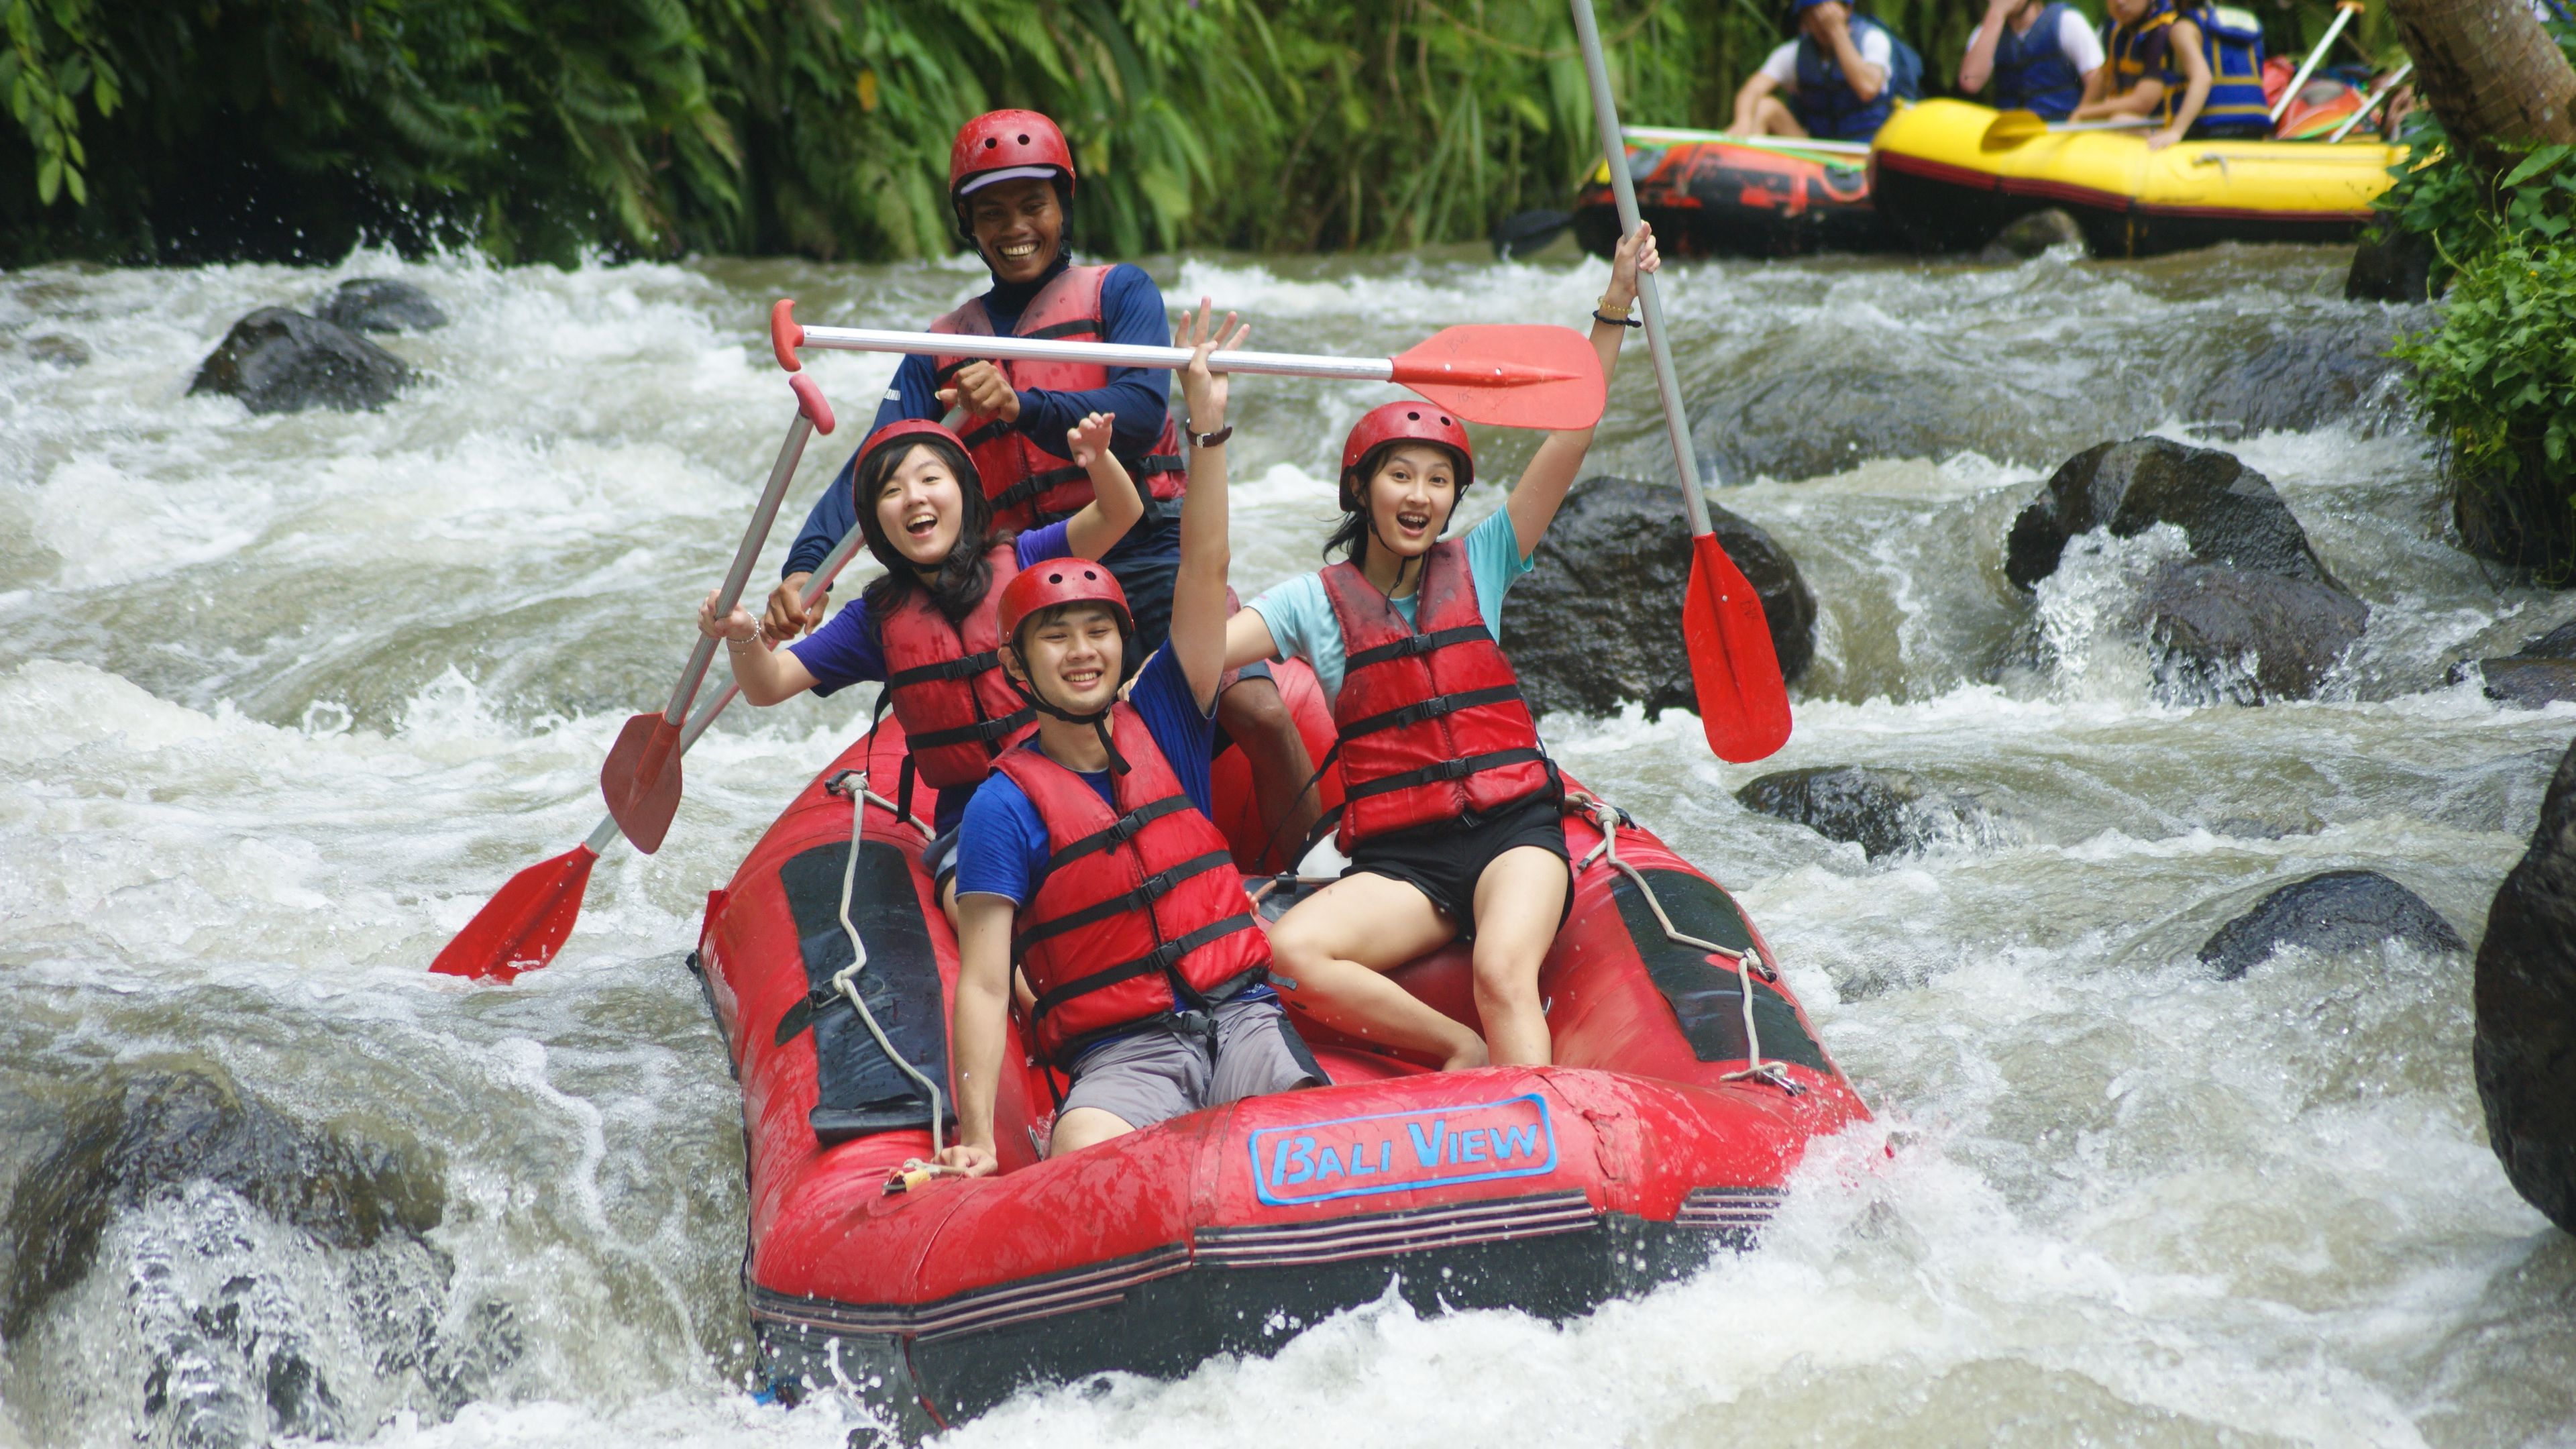 White Water Rafting & Zip Line Experience